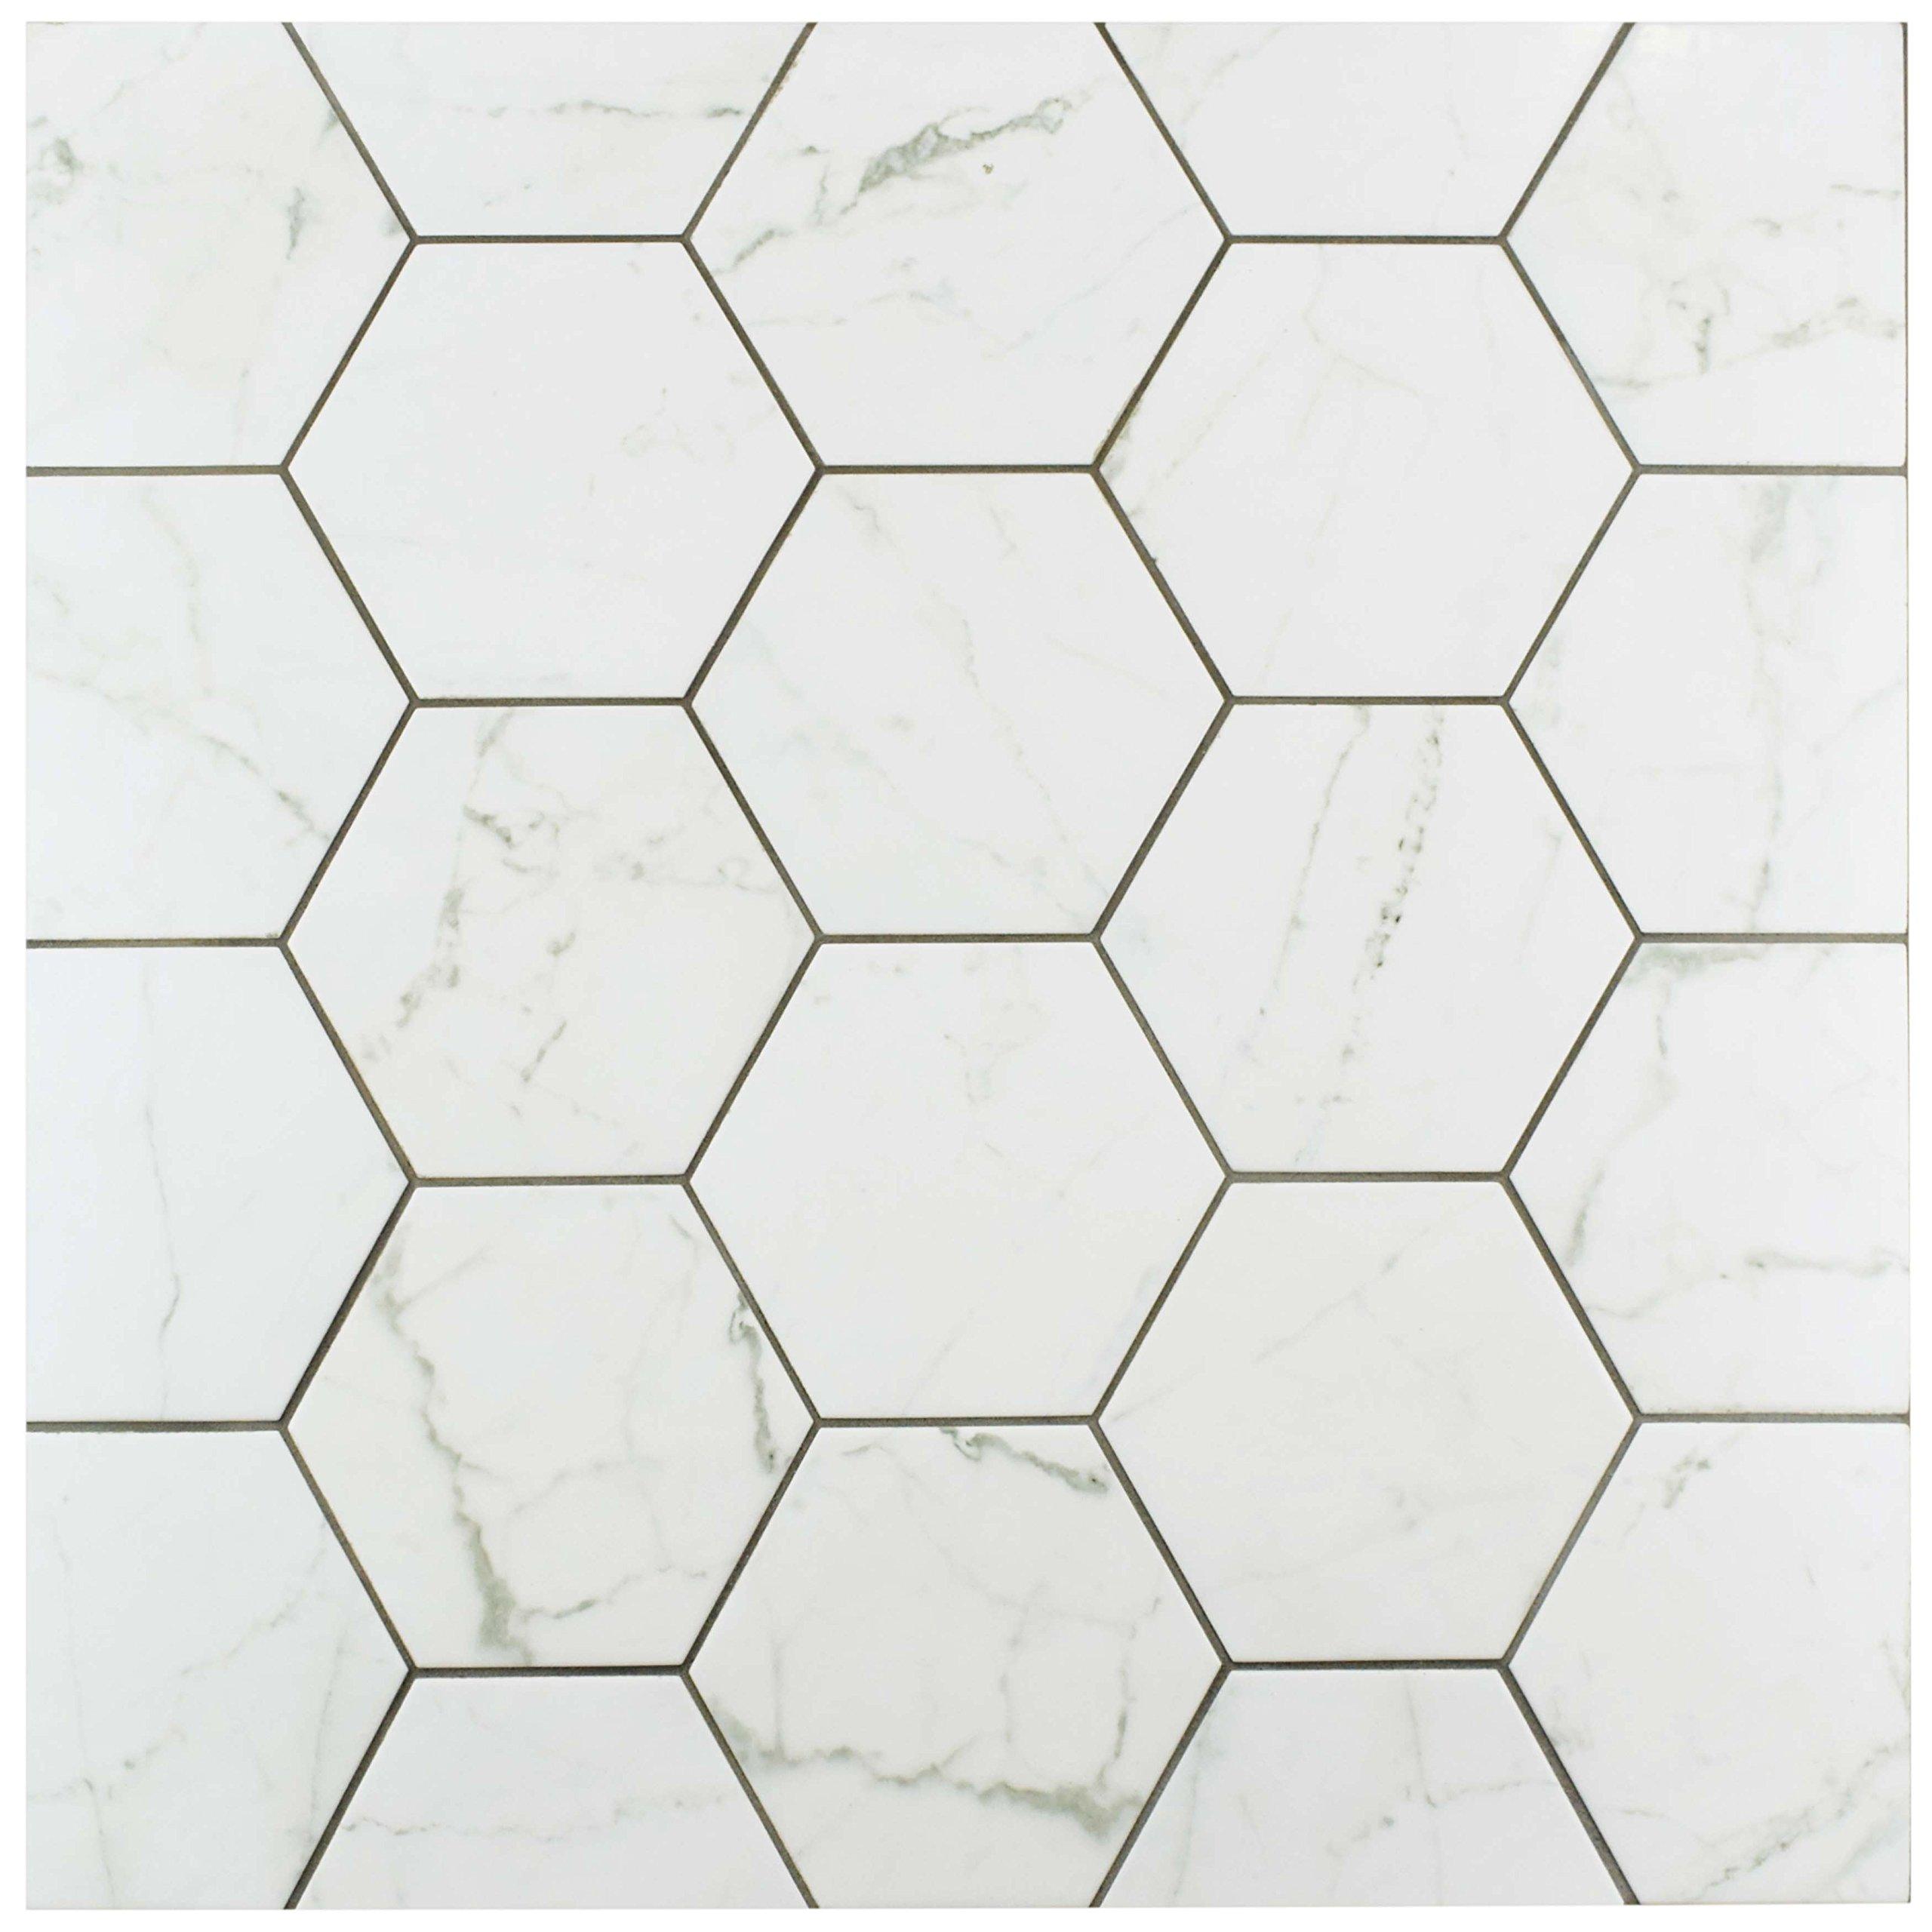 SomerTile FEQCRX Murmur Carrara Hexagon Porcelain Floor & Wall Tile, 7'' x 8'' (Pack of 25) by SOMERTILE (Image #5)